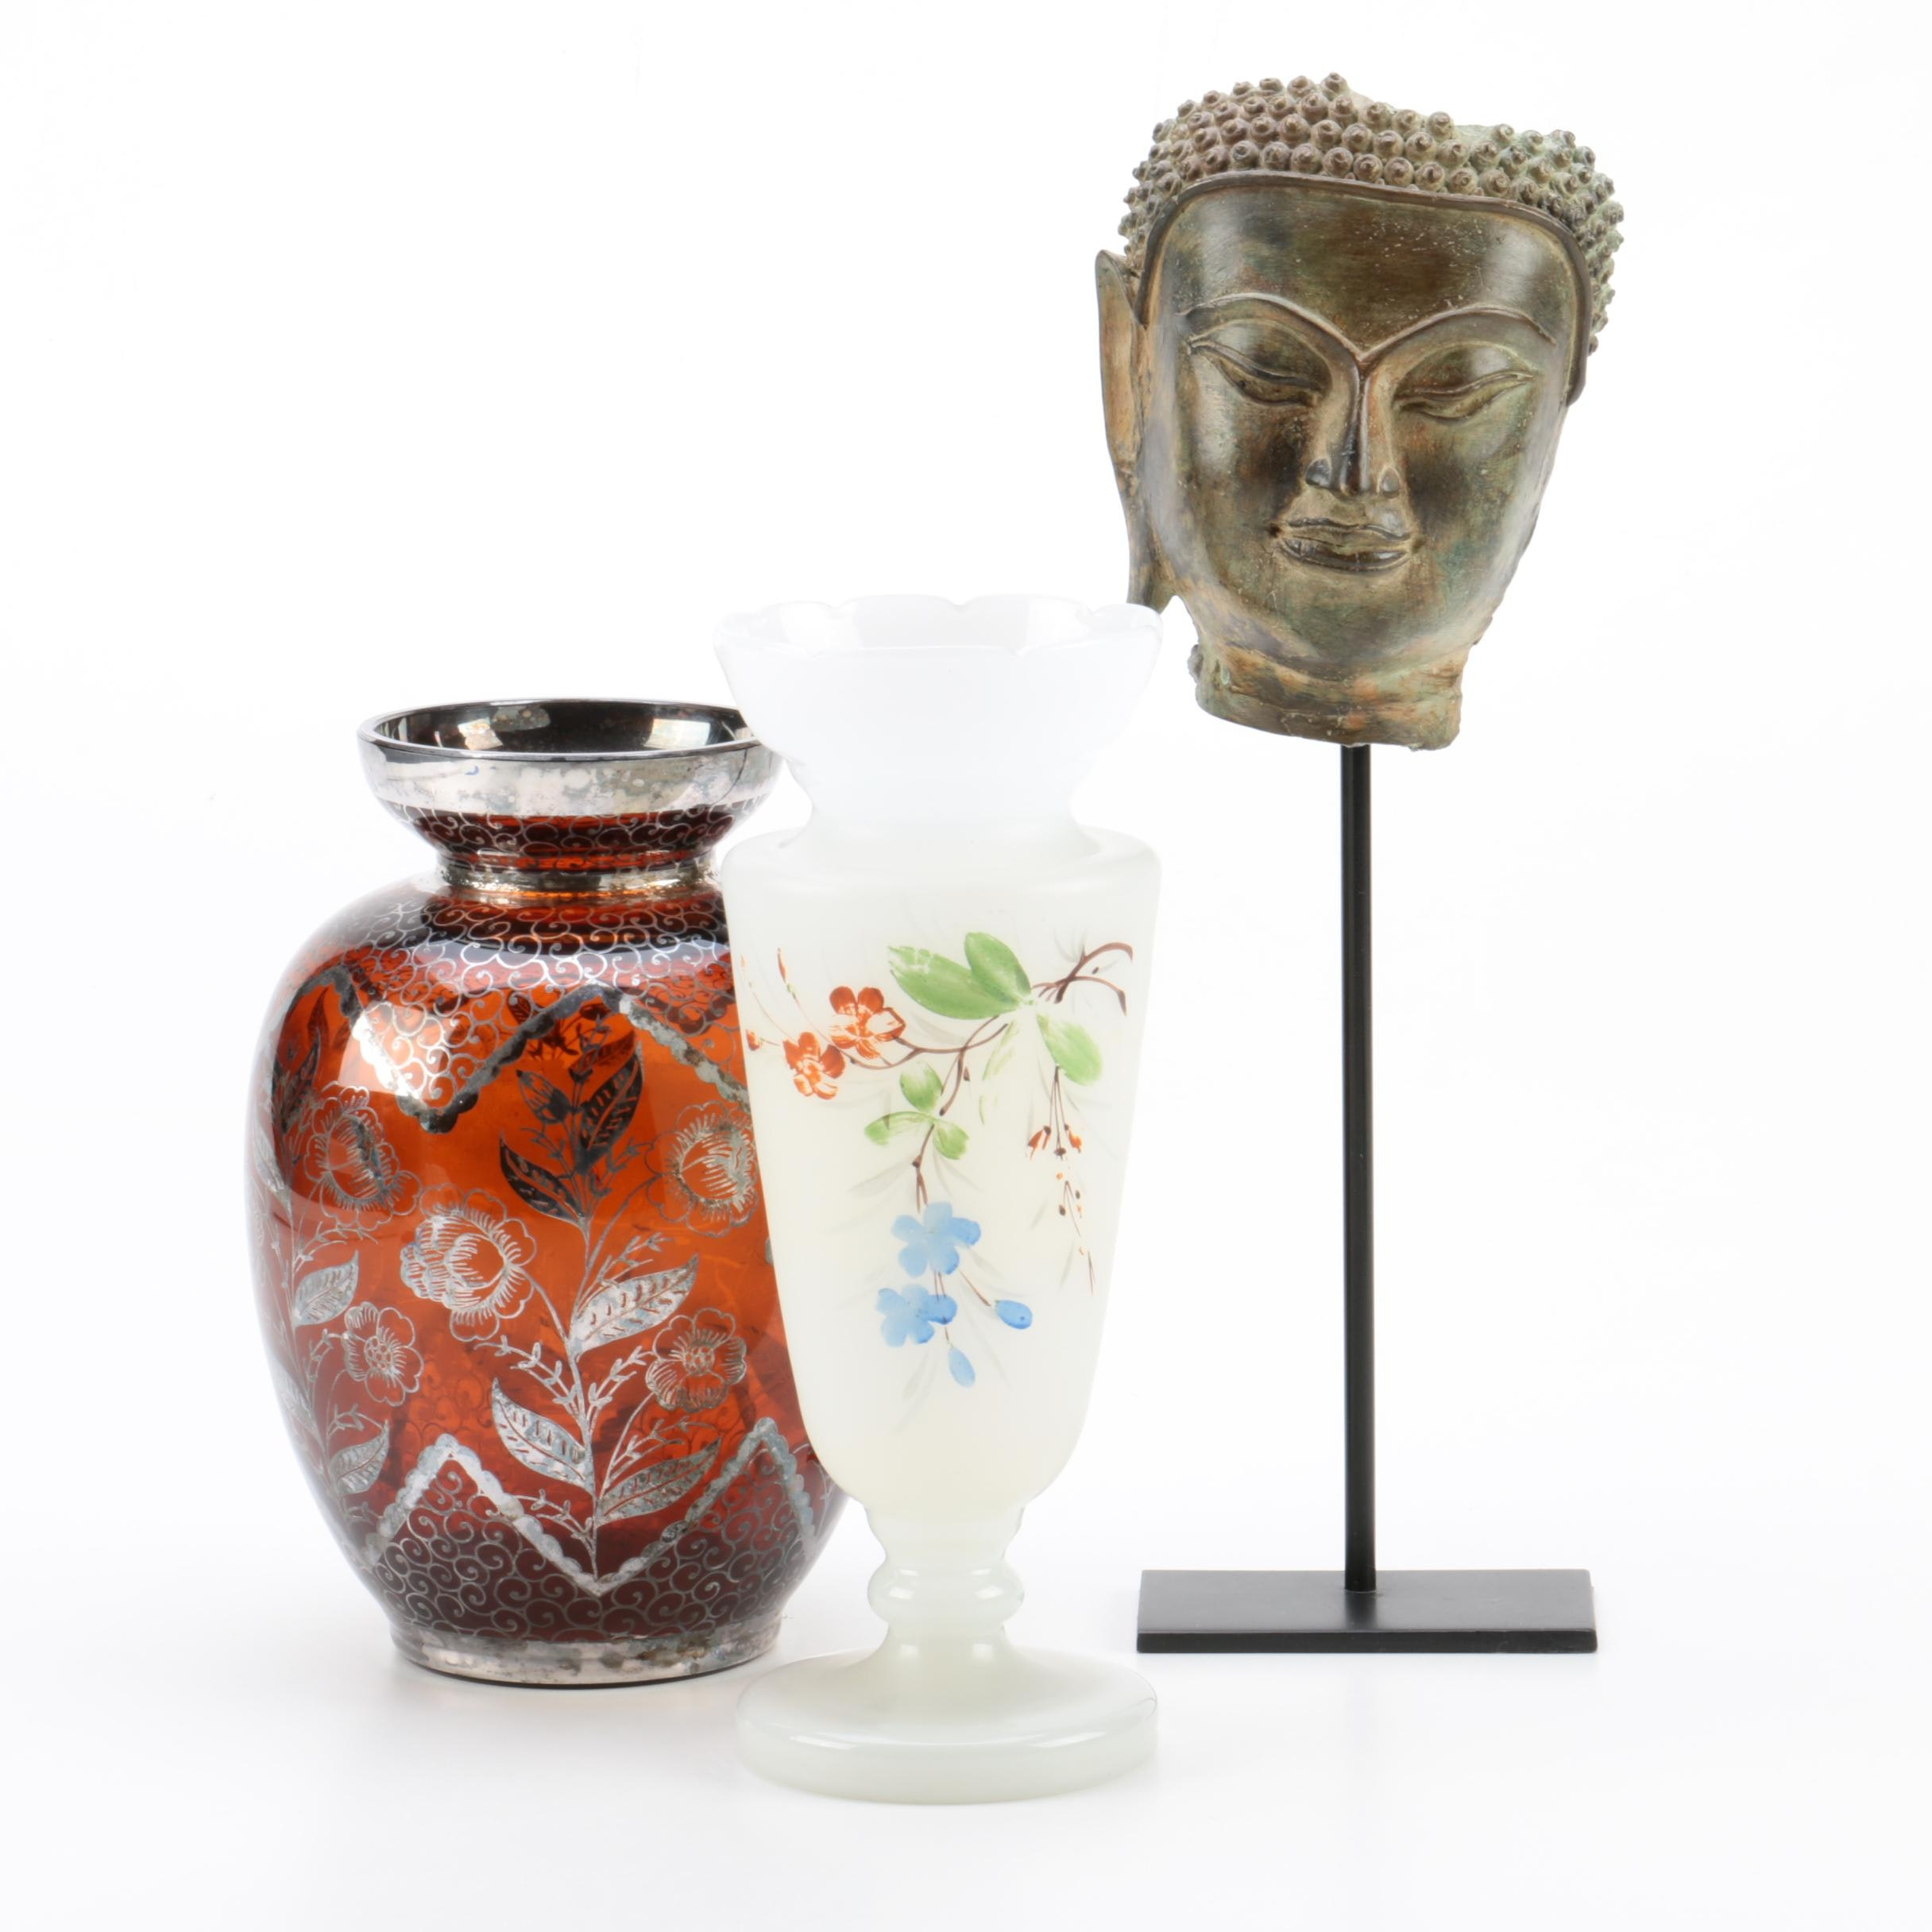 Buddha Mask and Glass Vases